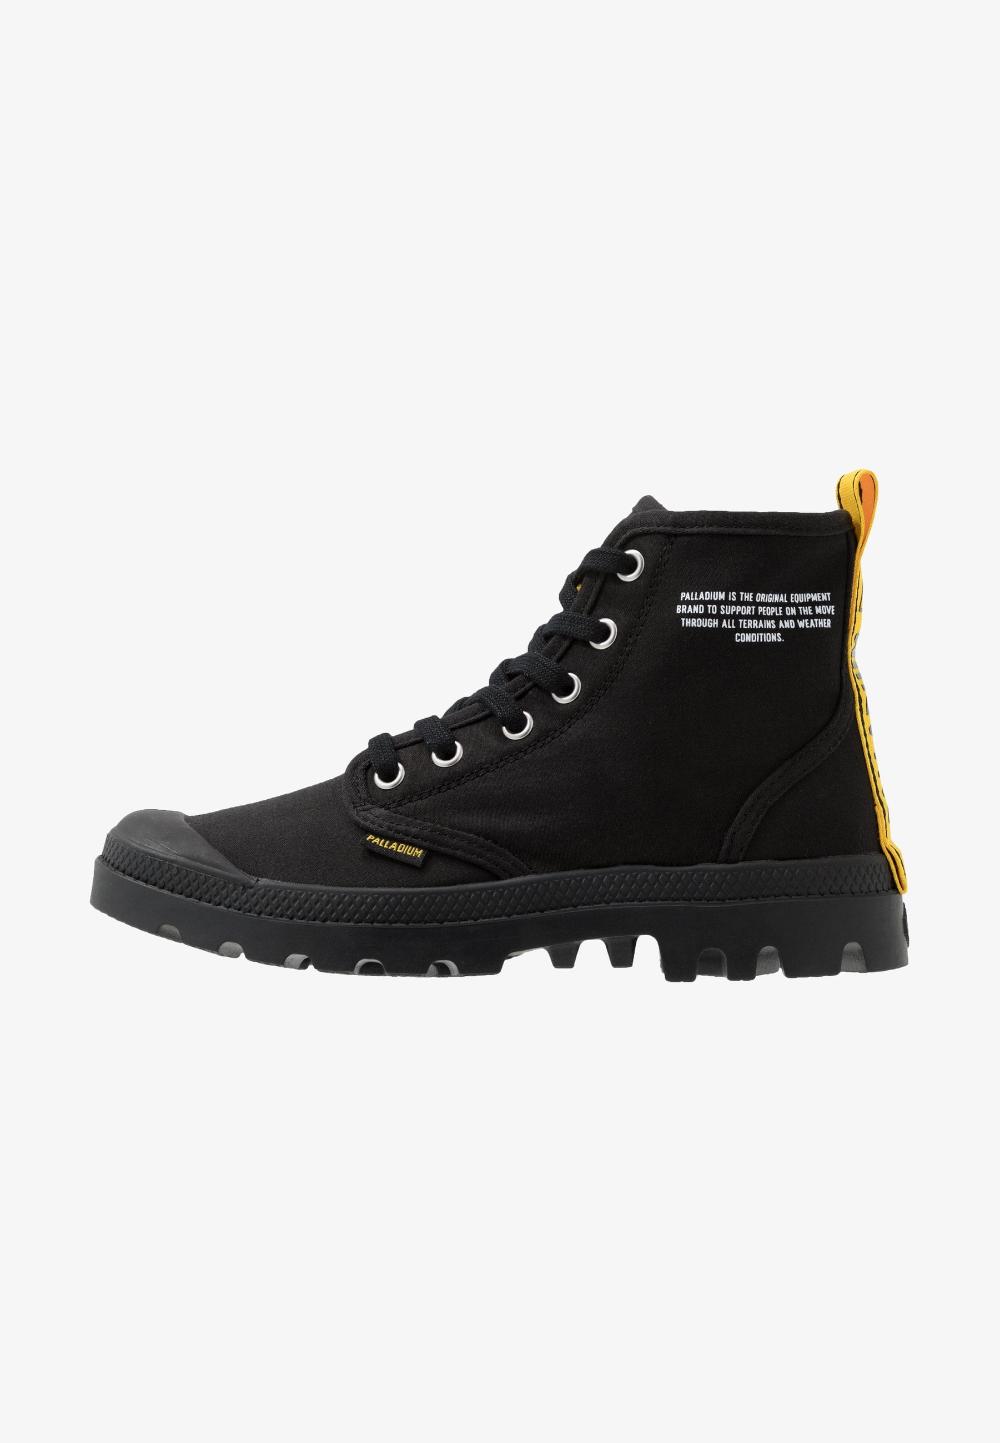 Palladium Pampa Dare Safety Botki Sznurowane Black Zalando Pl Boots Black Hiking Boots